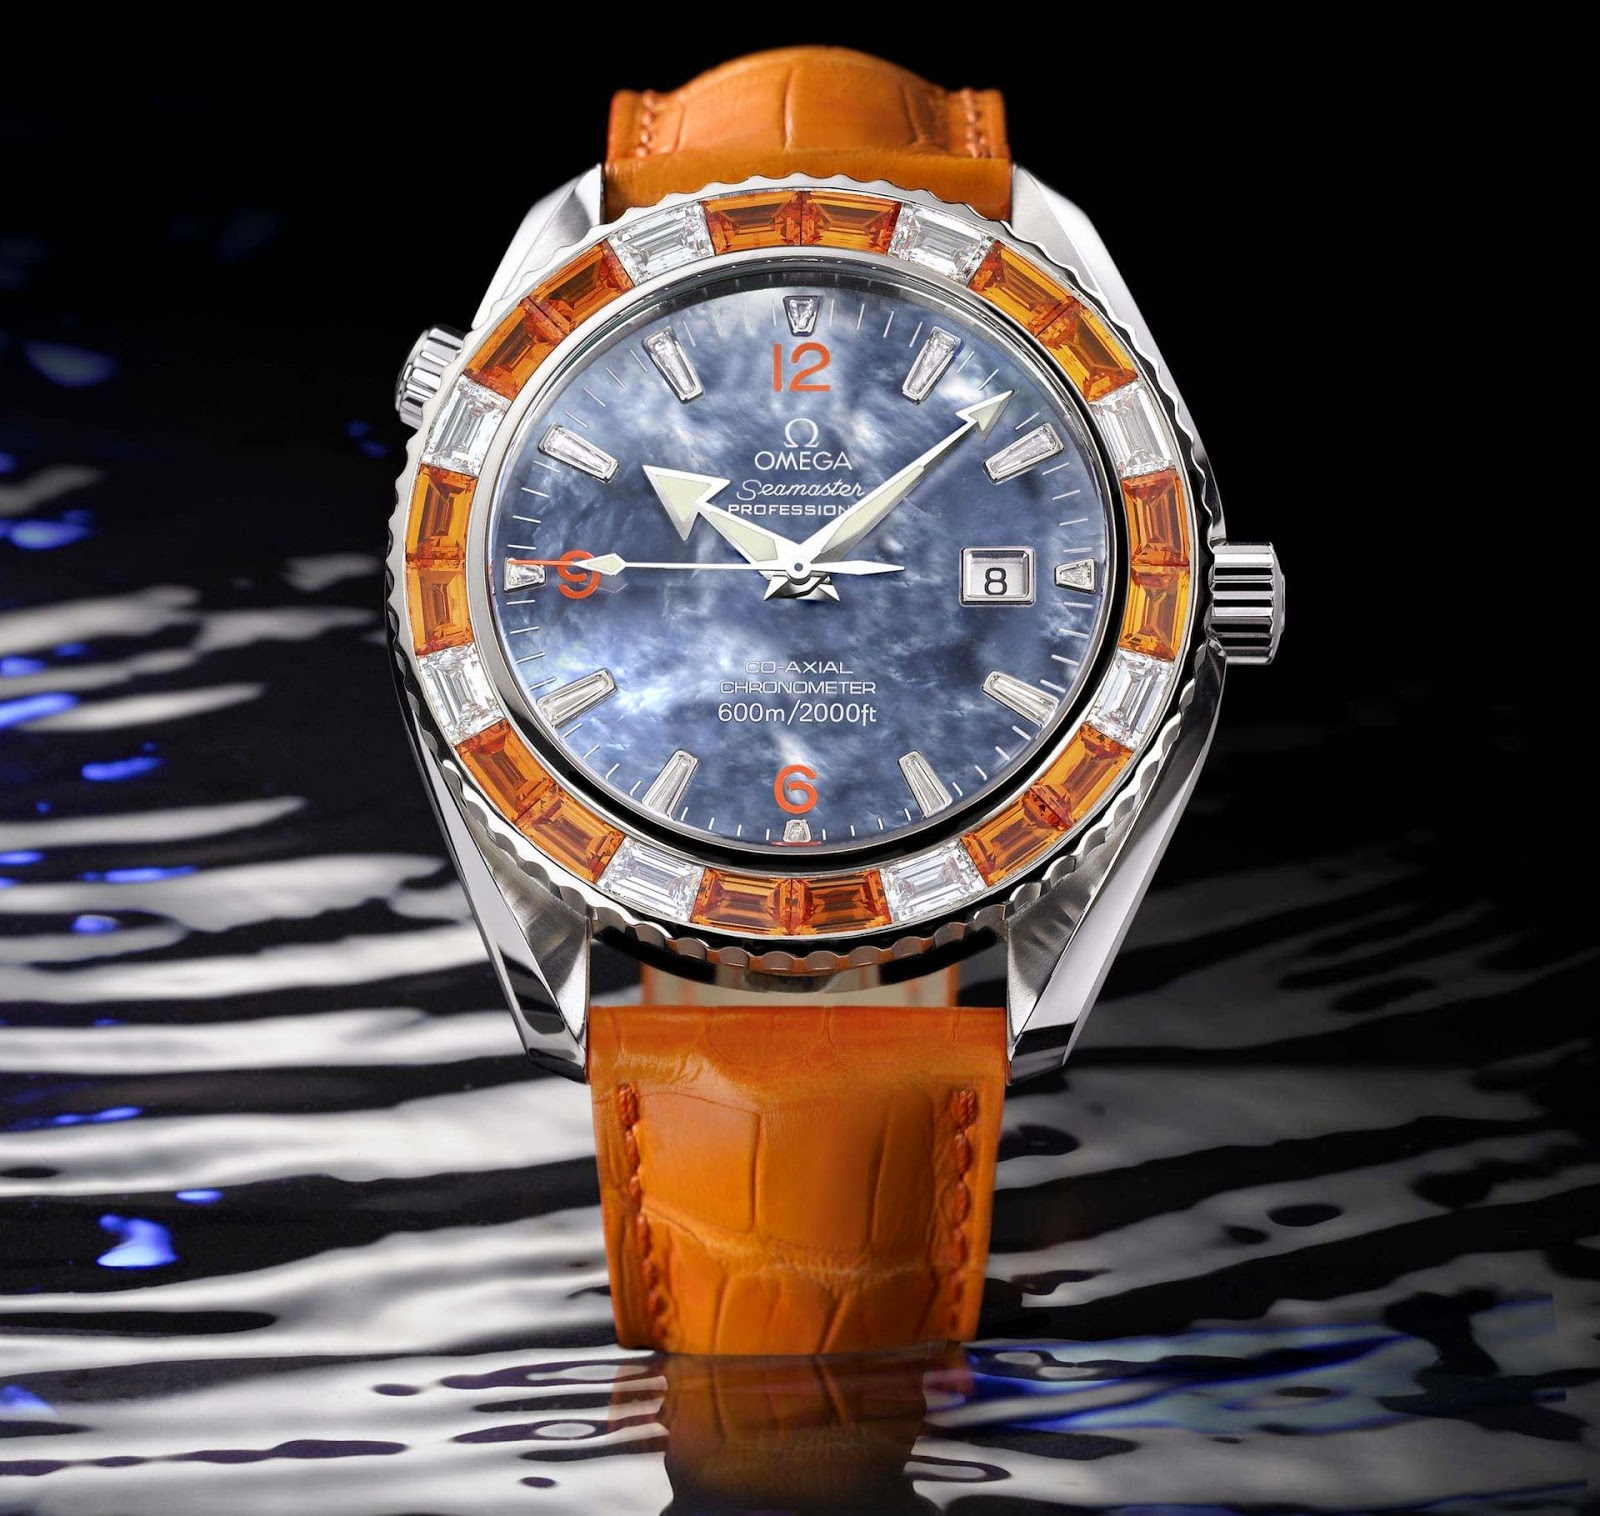 Omega Planet Ocean 'Orange Mecanique' automatic diving watch 600 meters